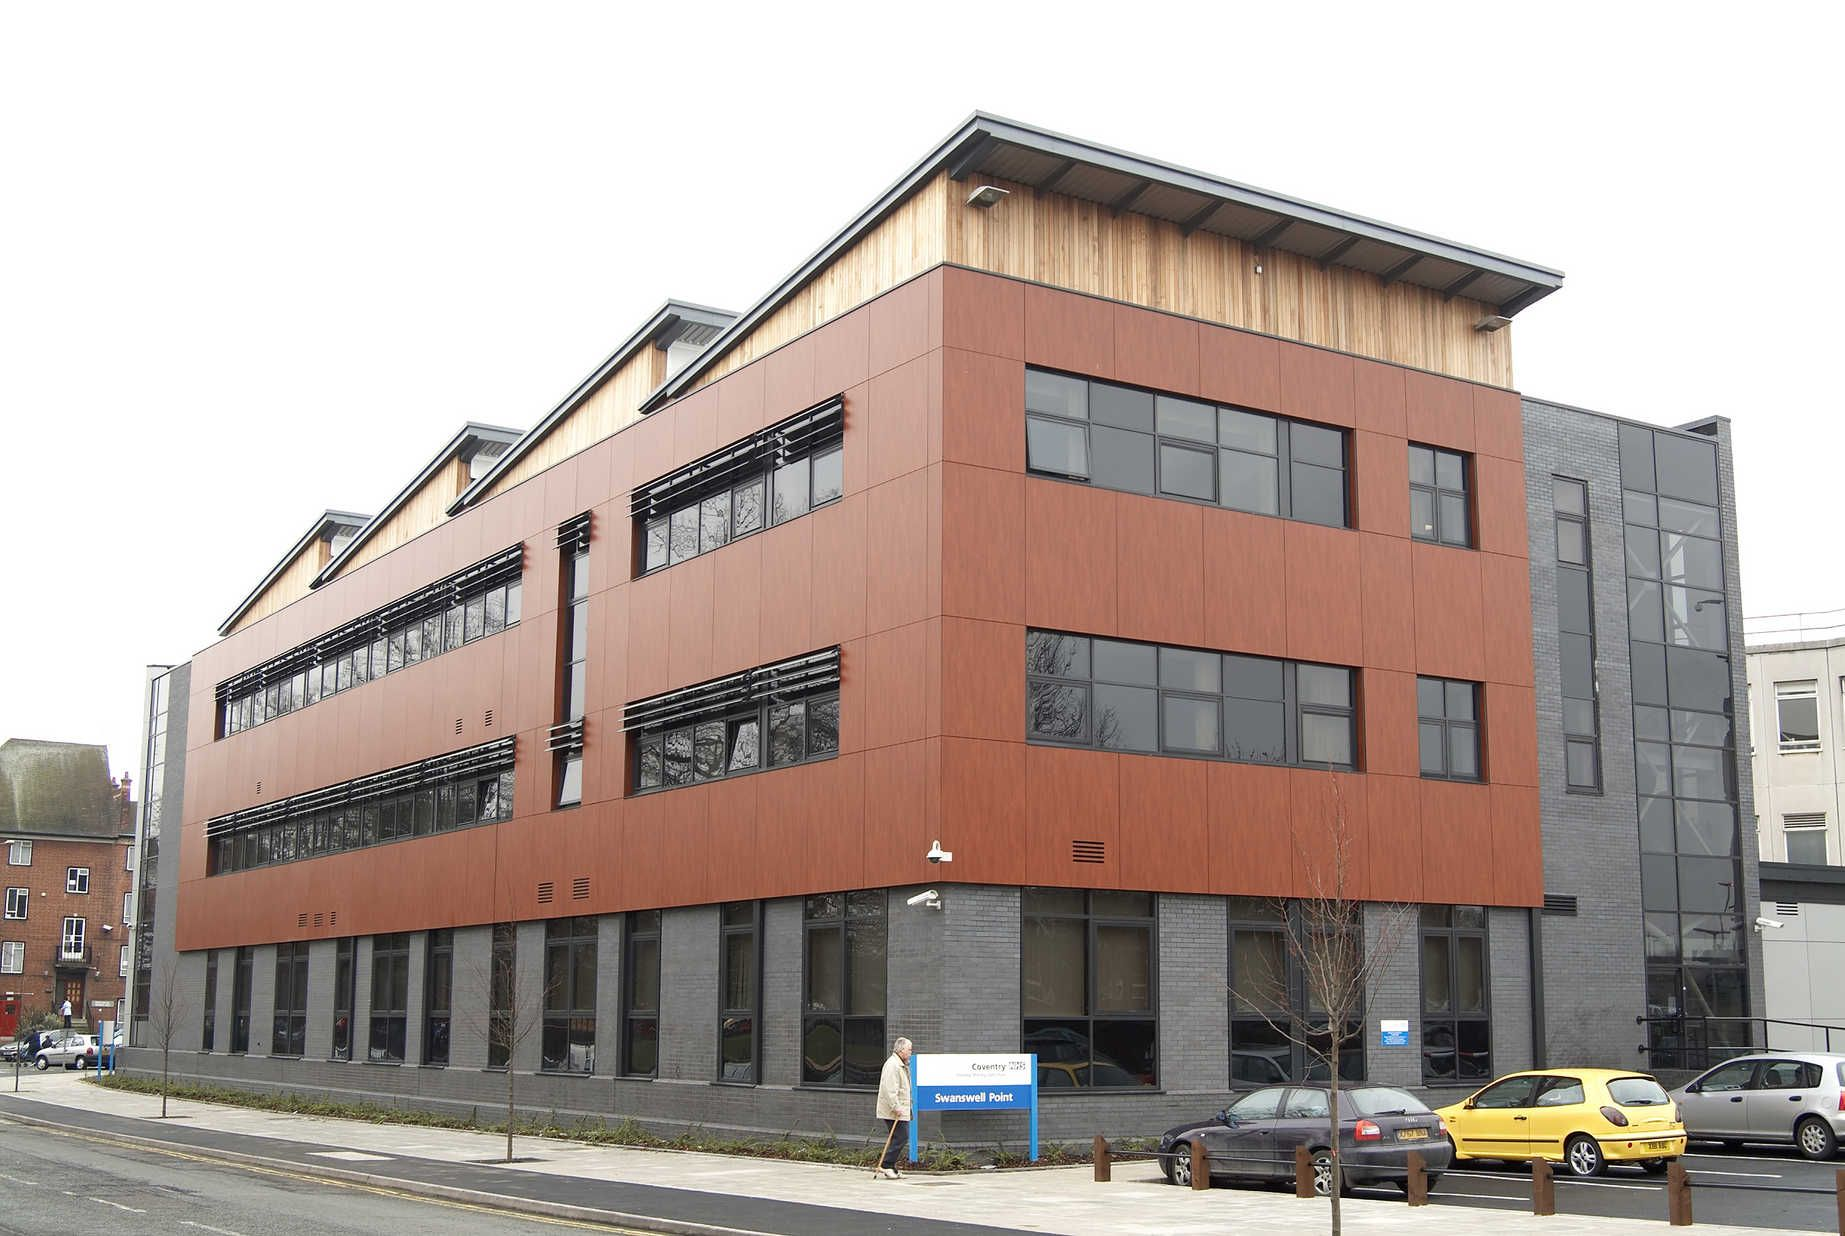 Trespa Architecture, Exterior cladding, Health